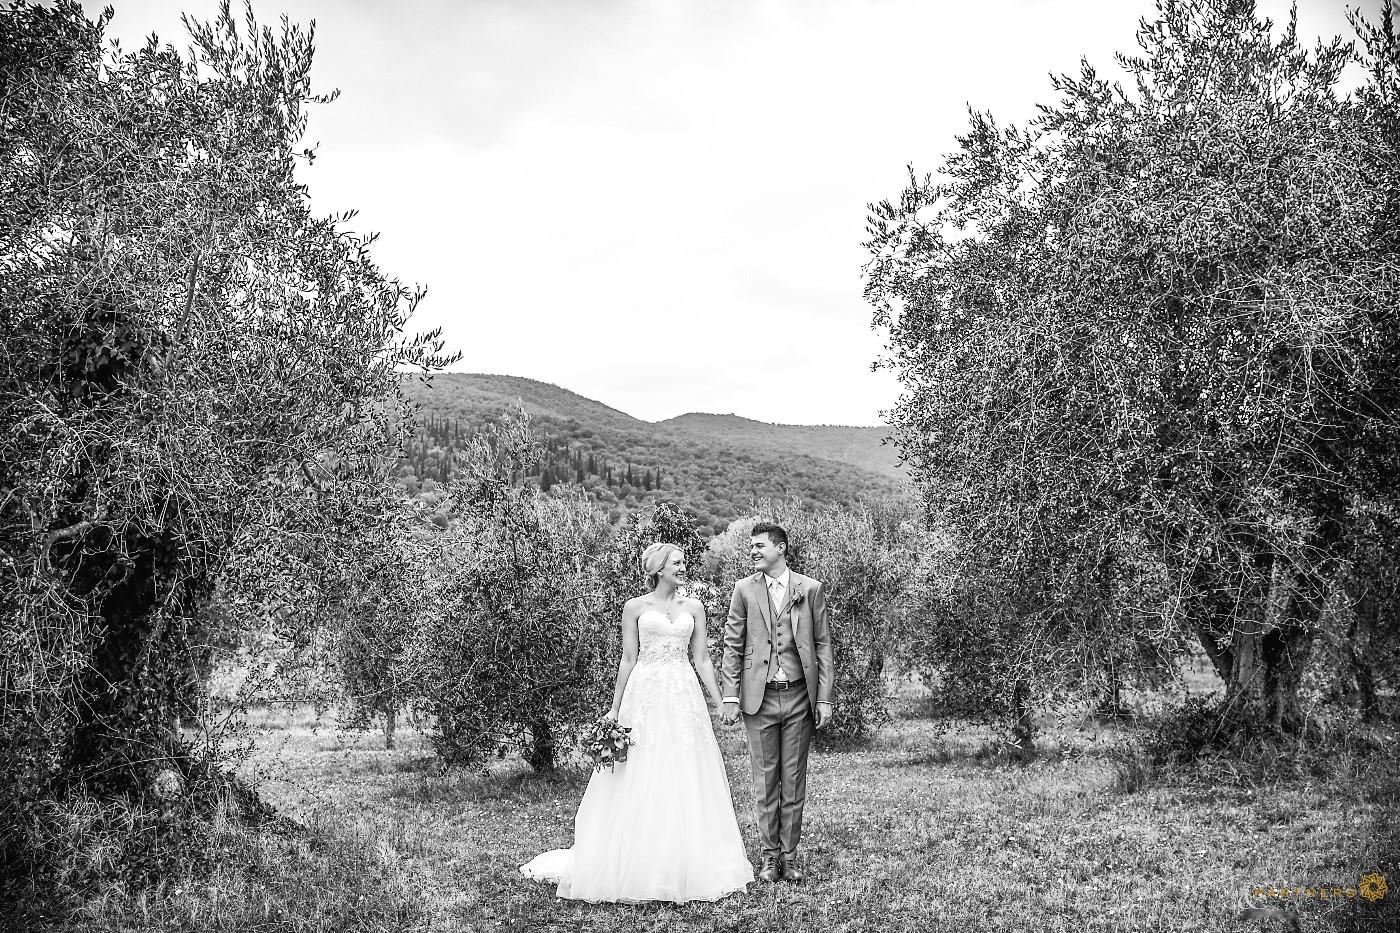 Among olive trees